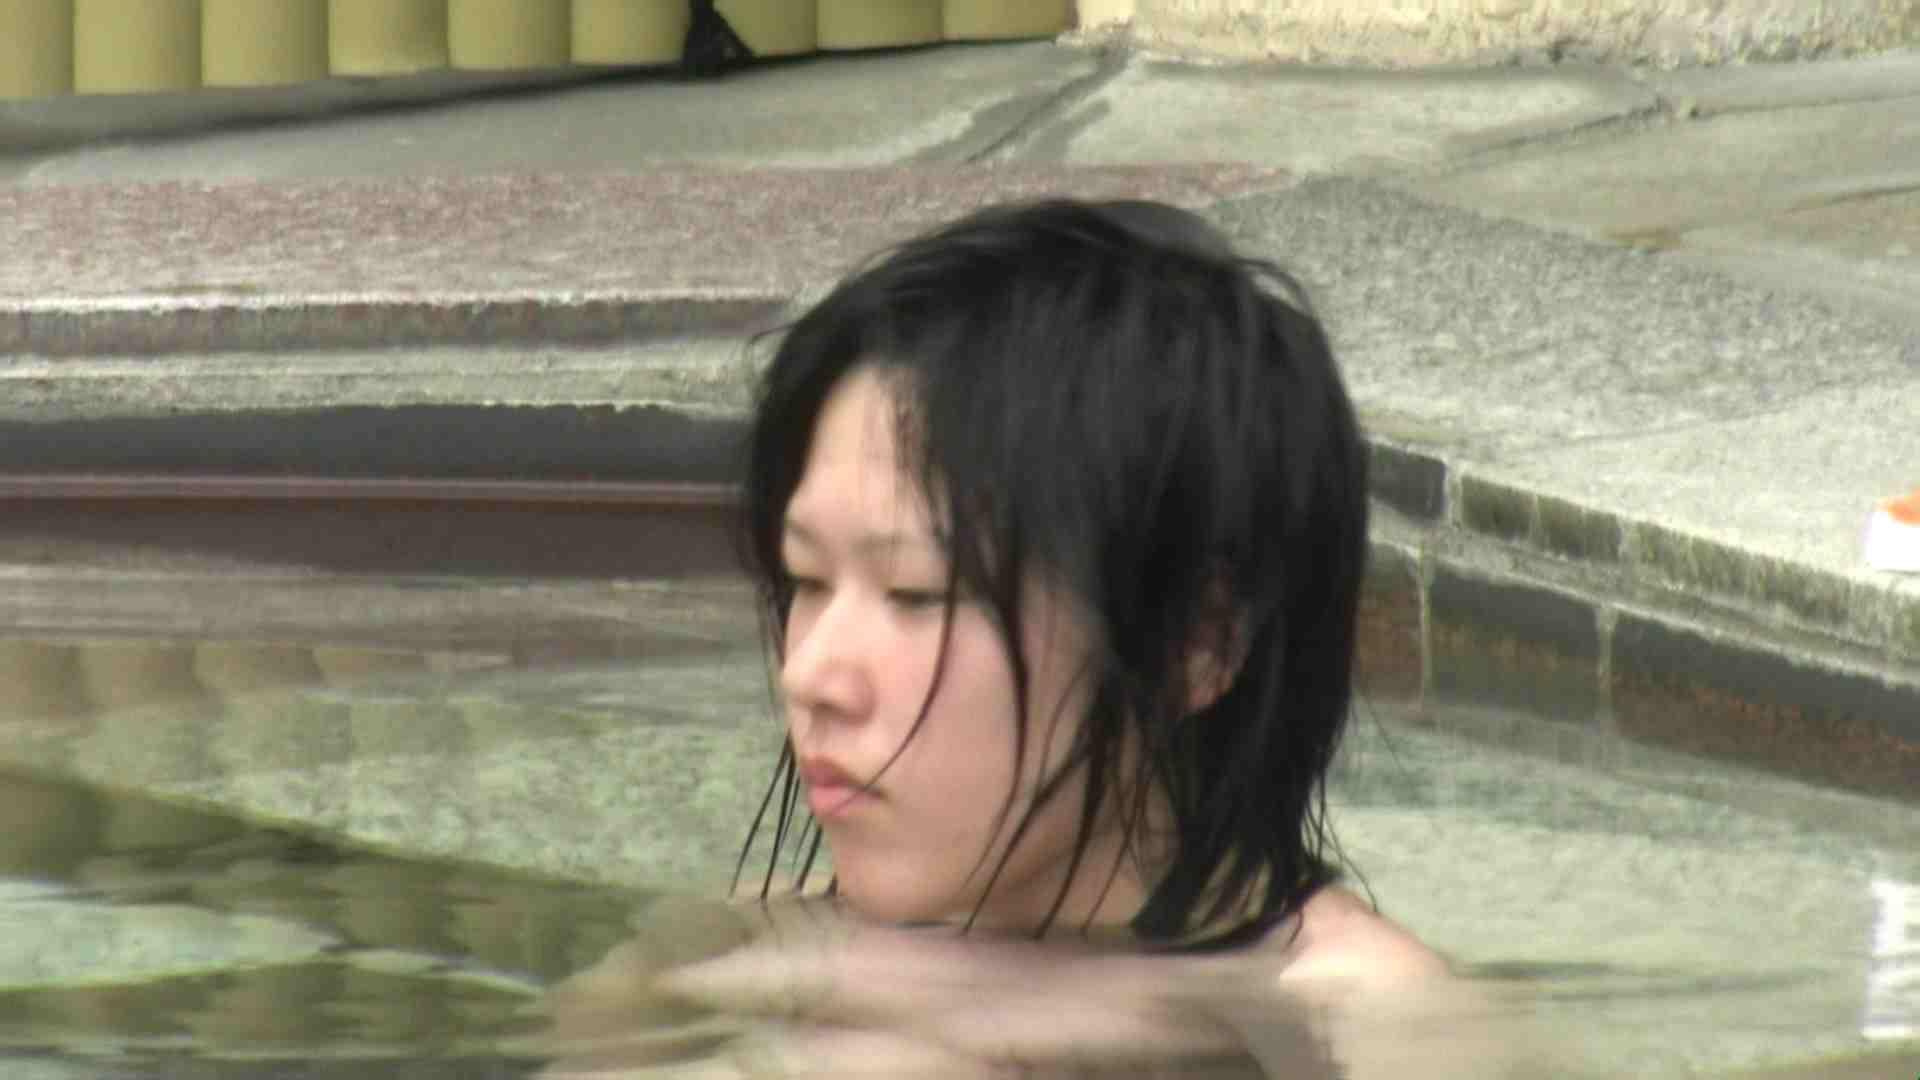 Aquaな露天風呂Vol.36 盗撮シリーズ   露天風呂編  99PIX 43